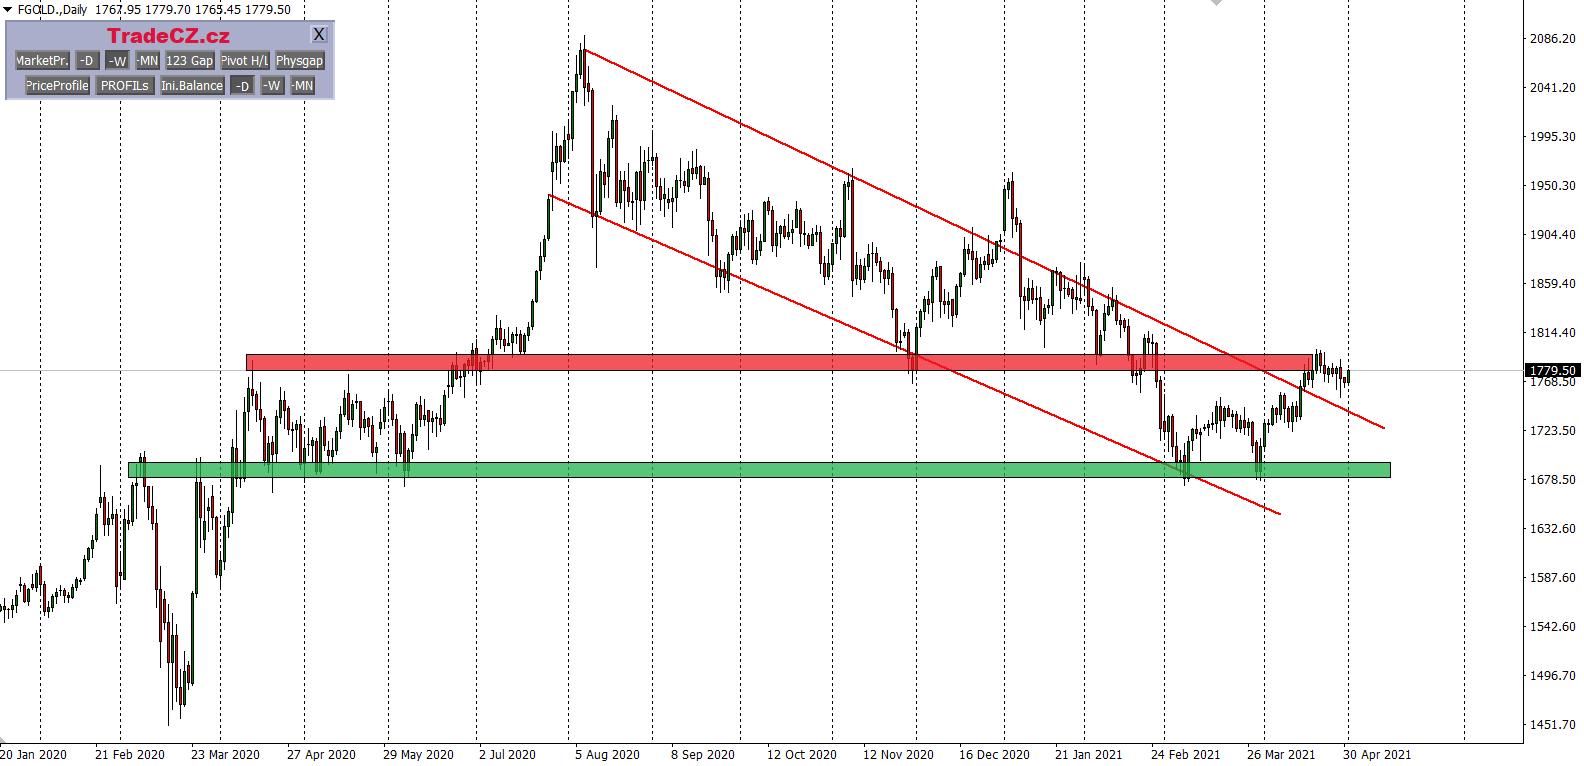 Zlato analýza price action